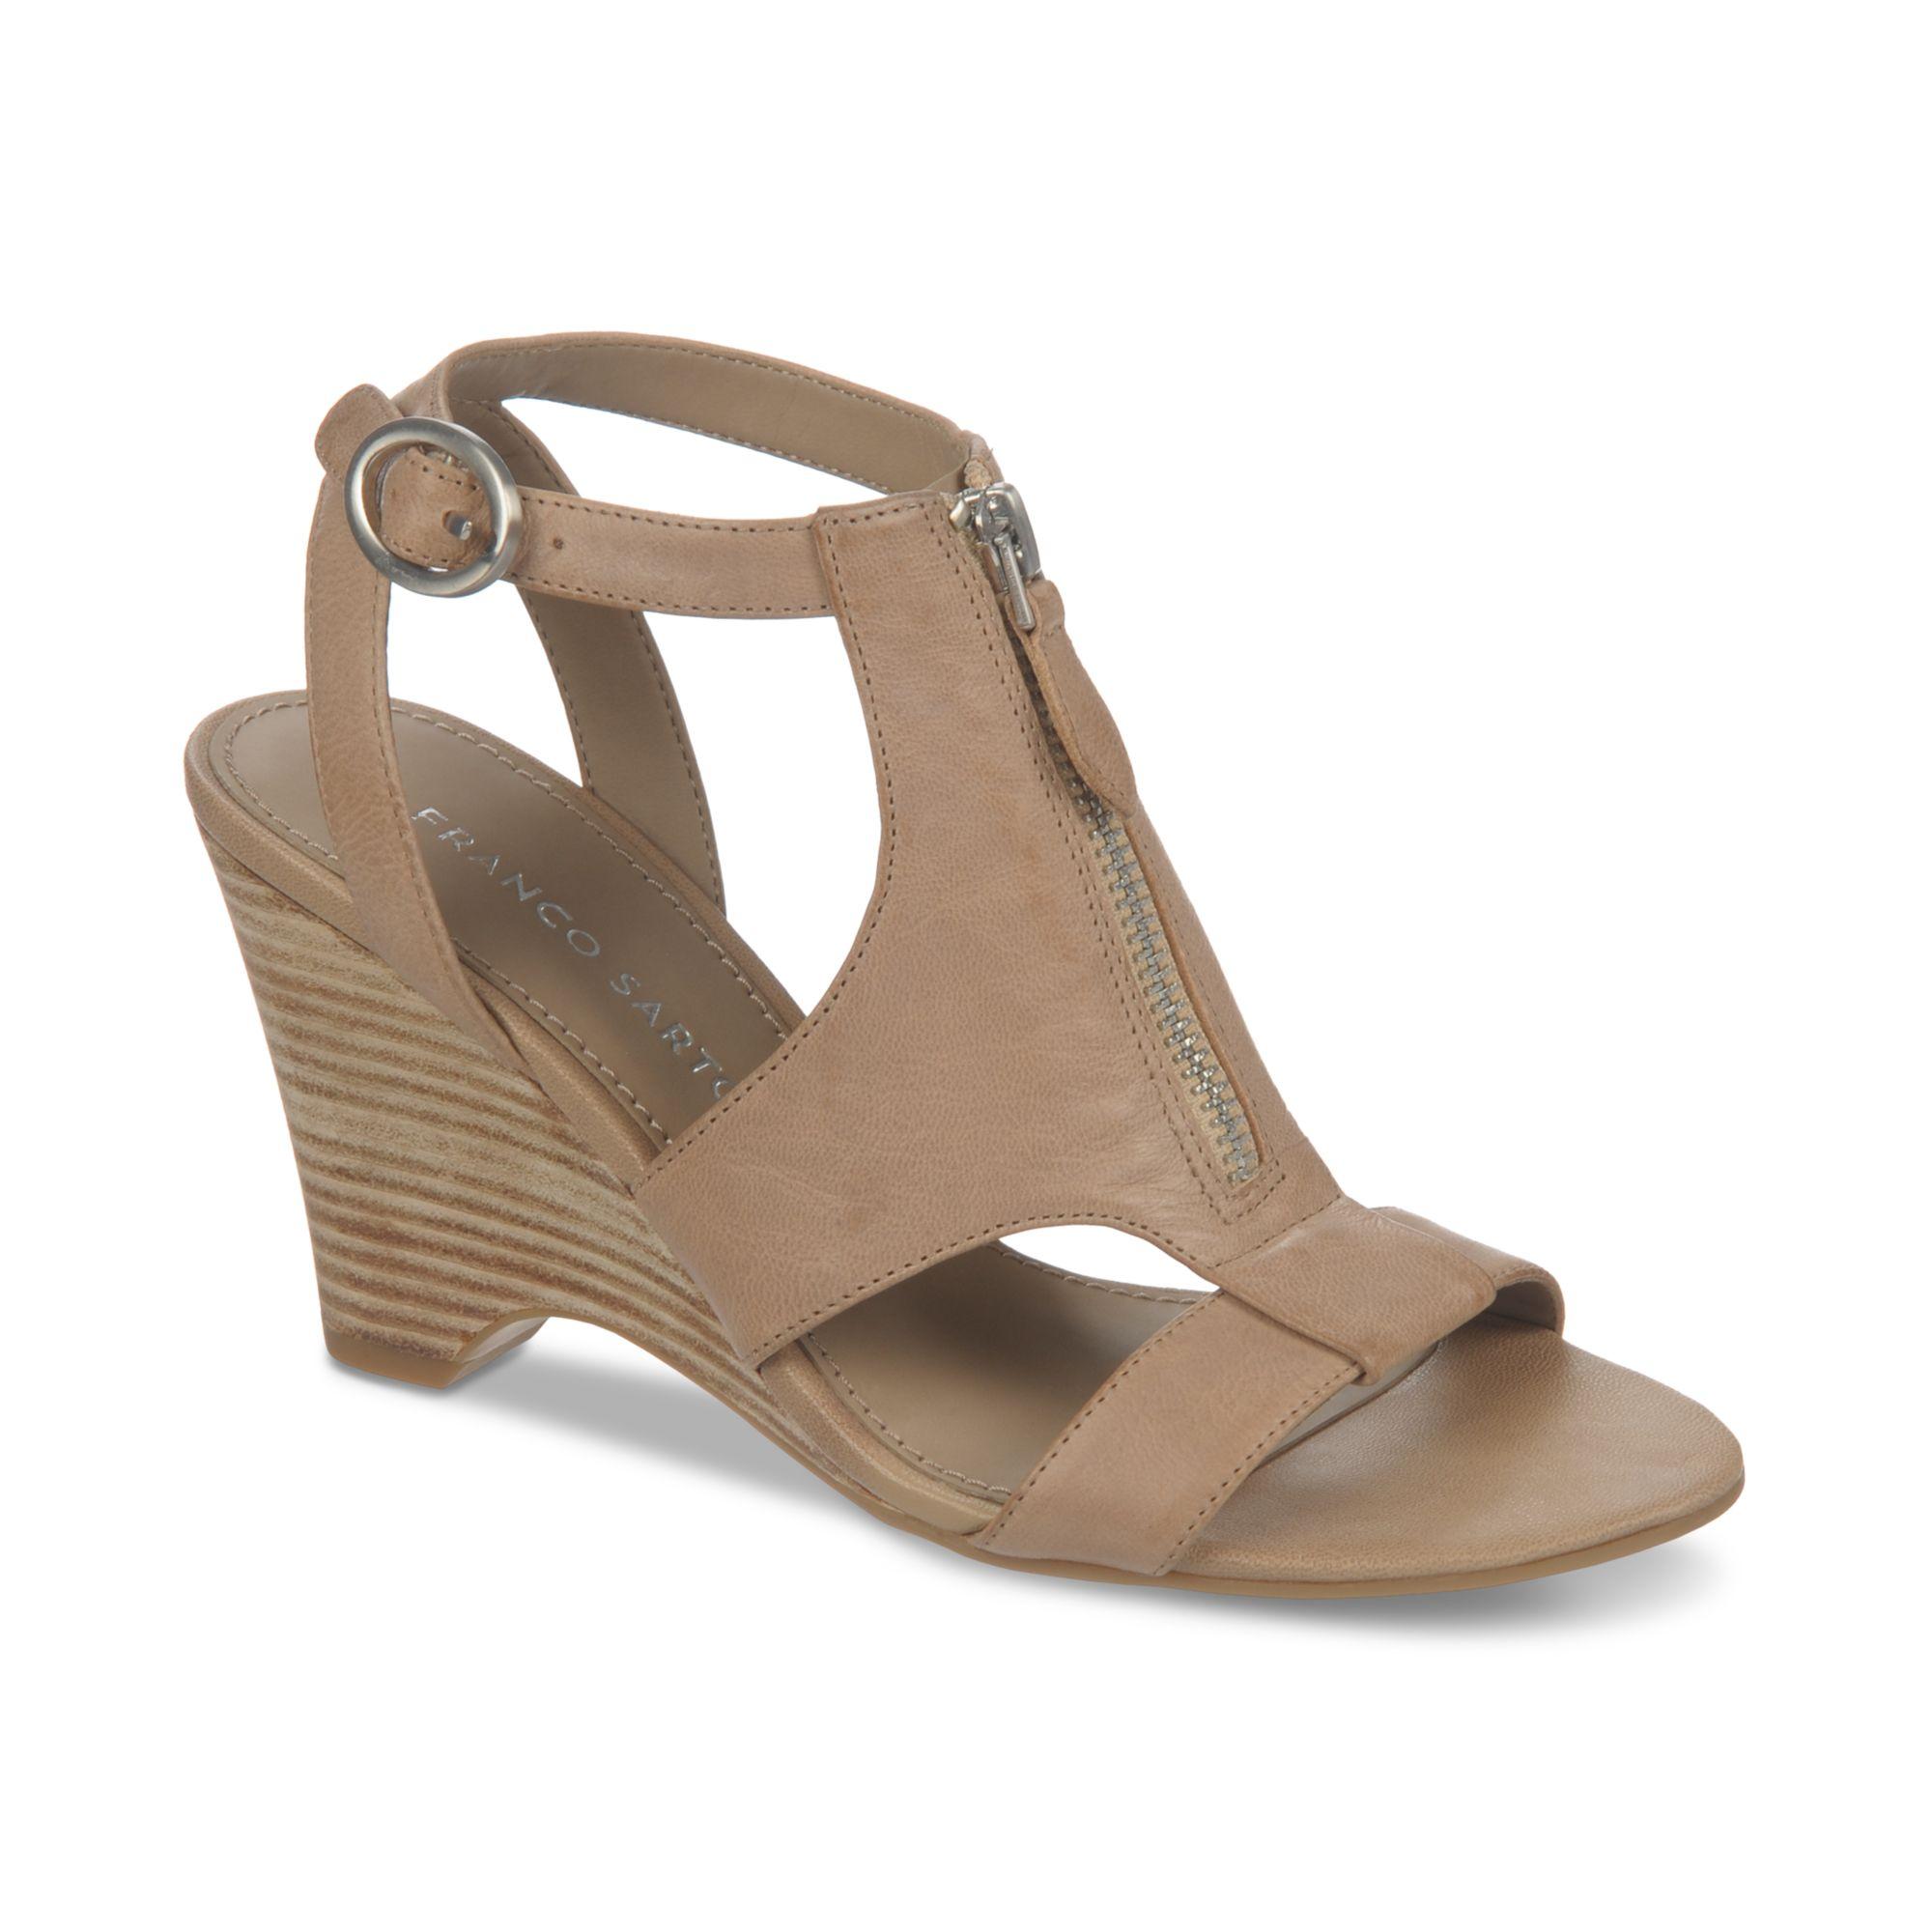 franco sarto tish wedge sandals in lyst